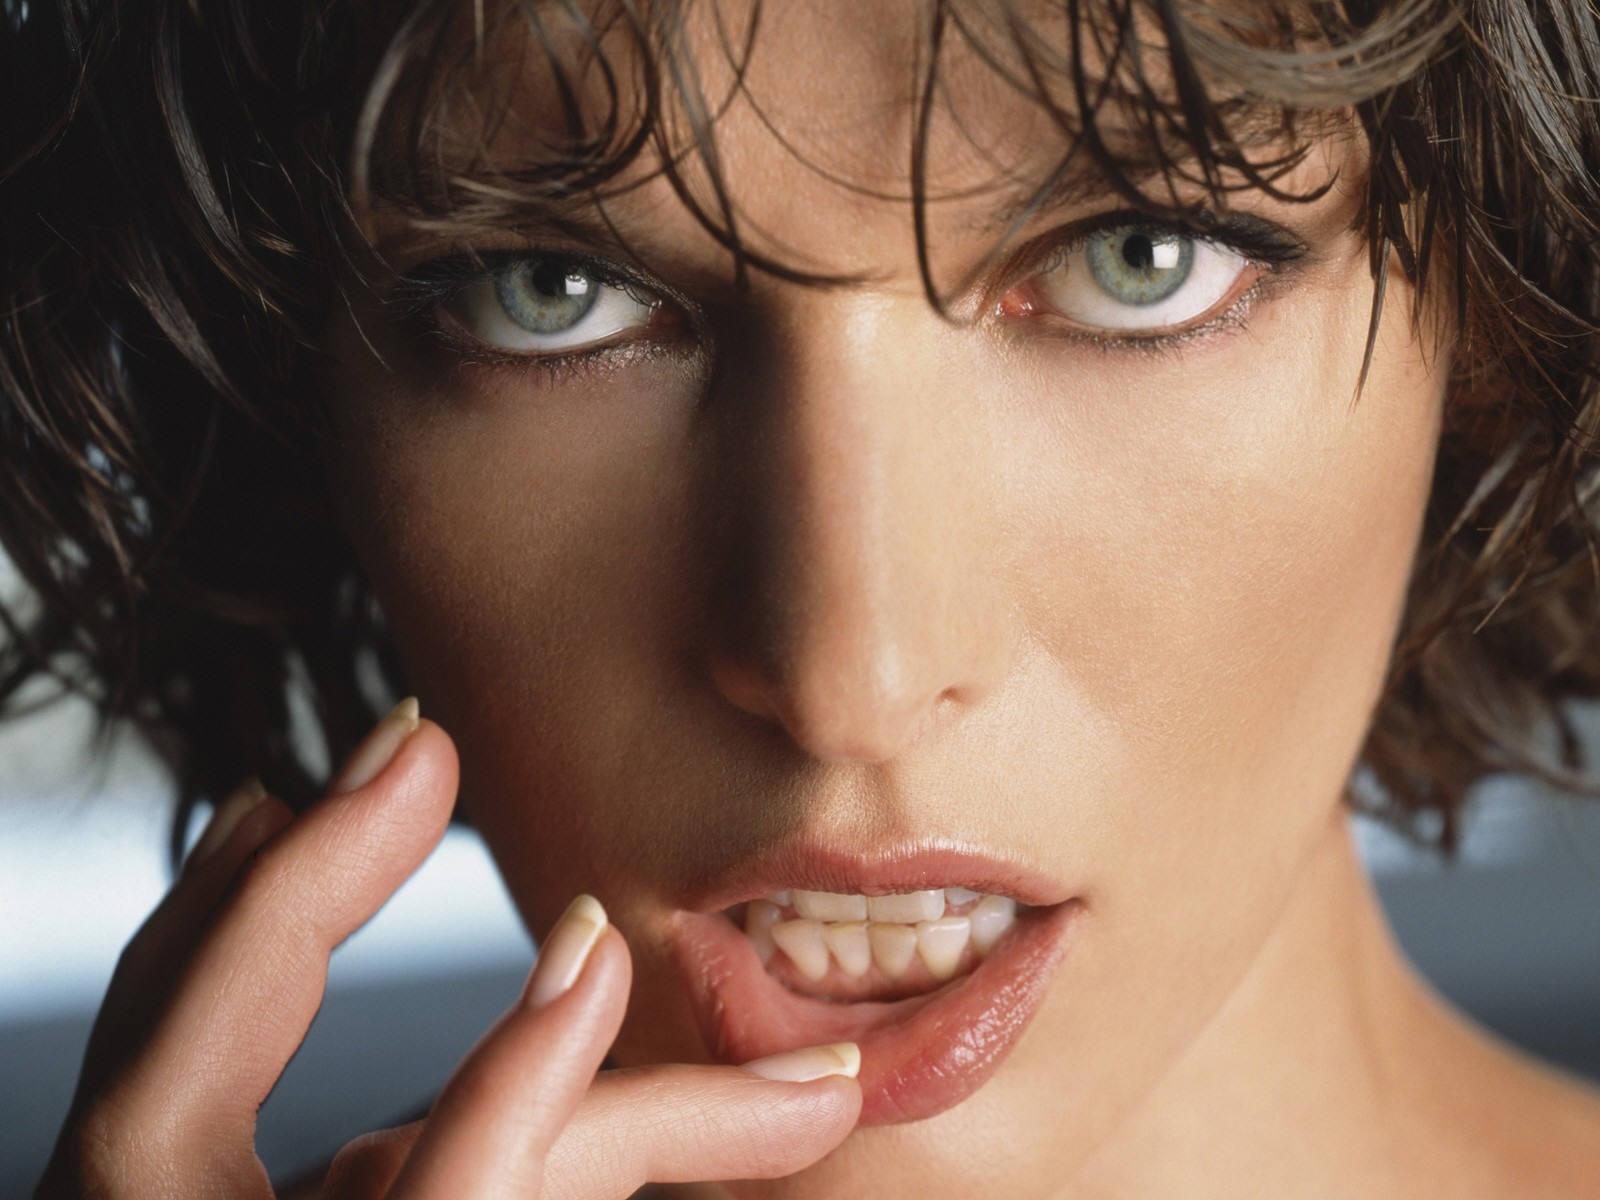 http://3.bp.blogspot.com/_W1ueYt1O3xs/STvr-7HSPEI/AAAAAAAAM-0/LK2laFzyDVc/d/Milla+Jovovich.jpg